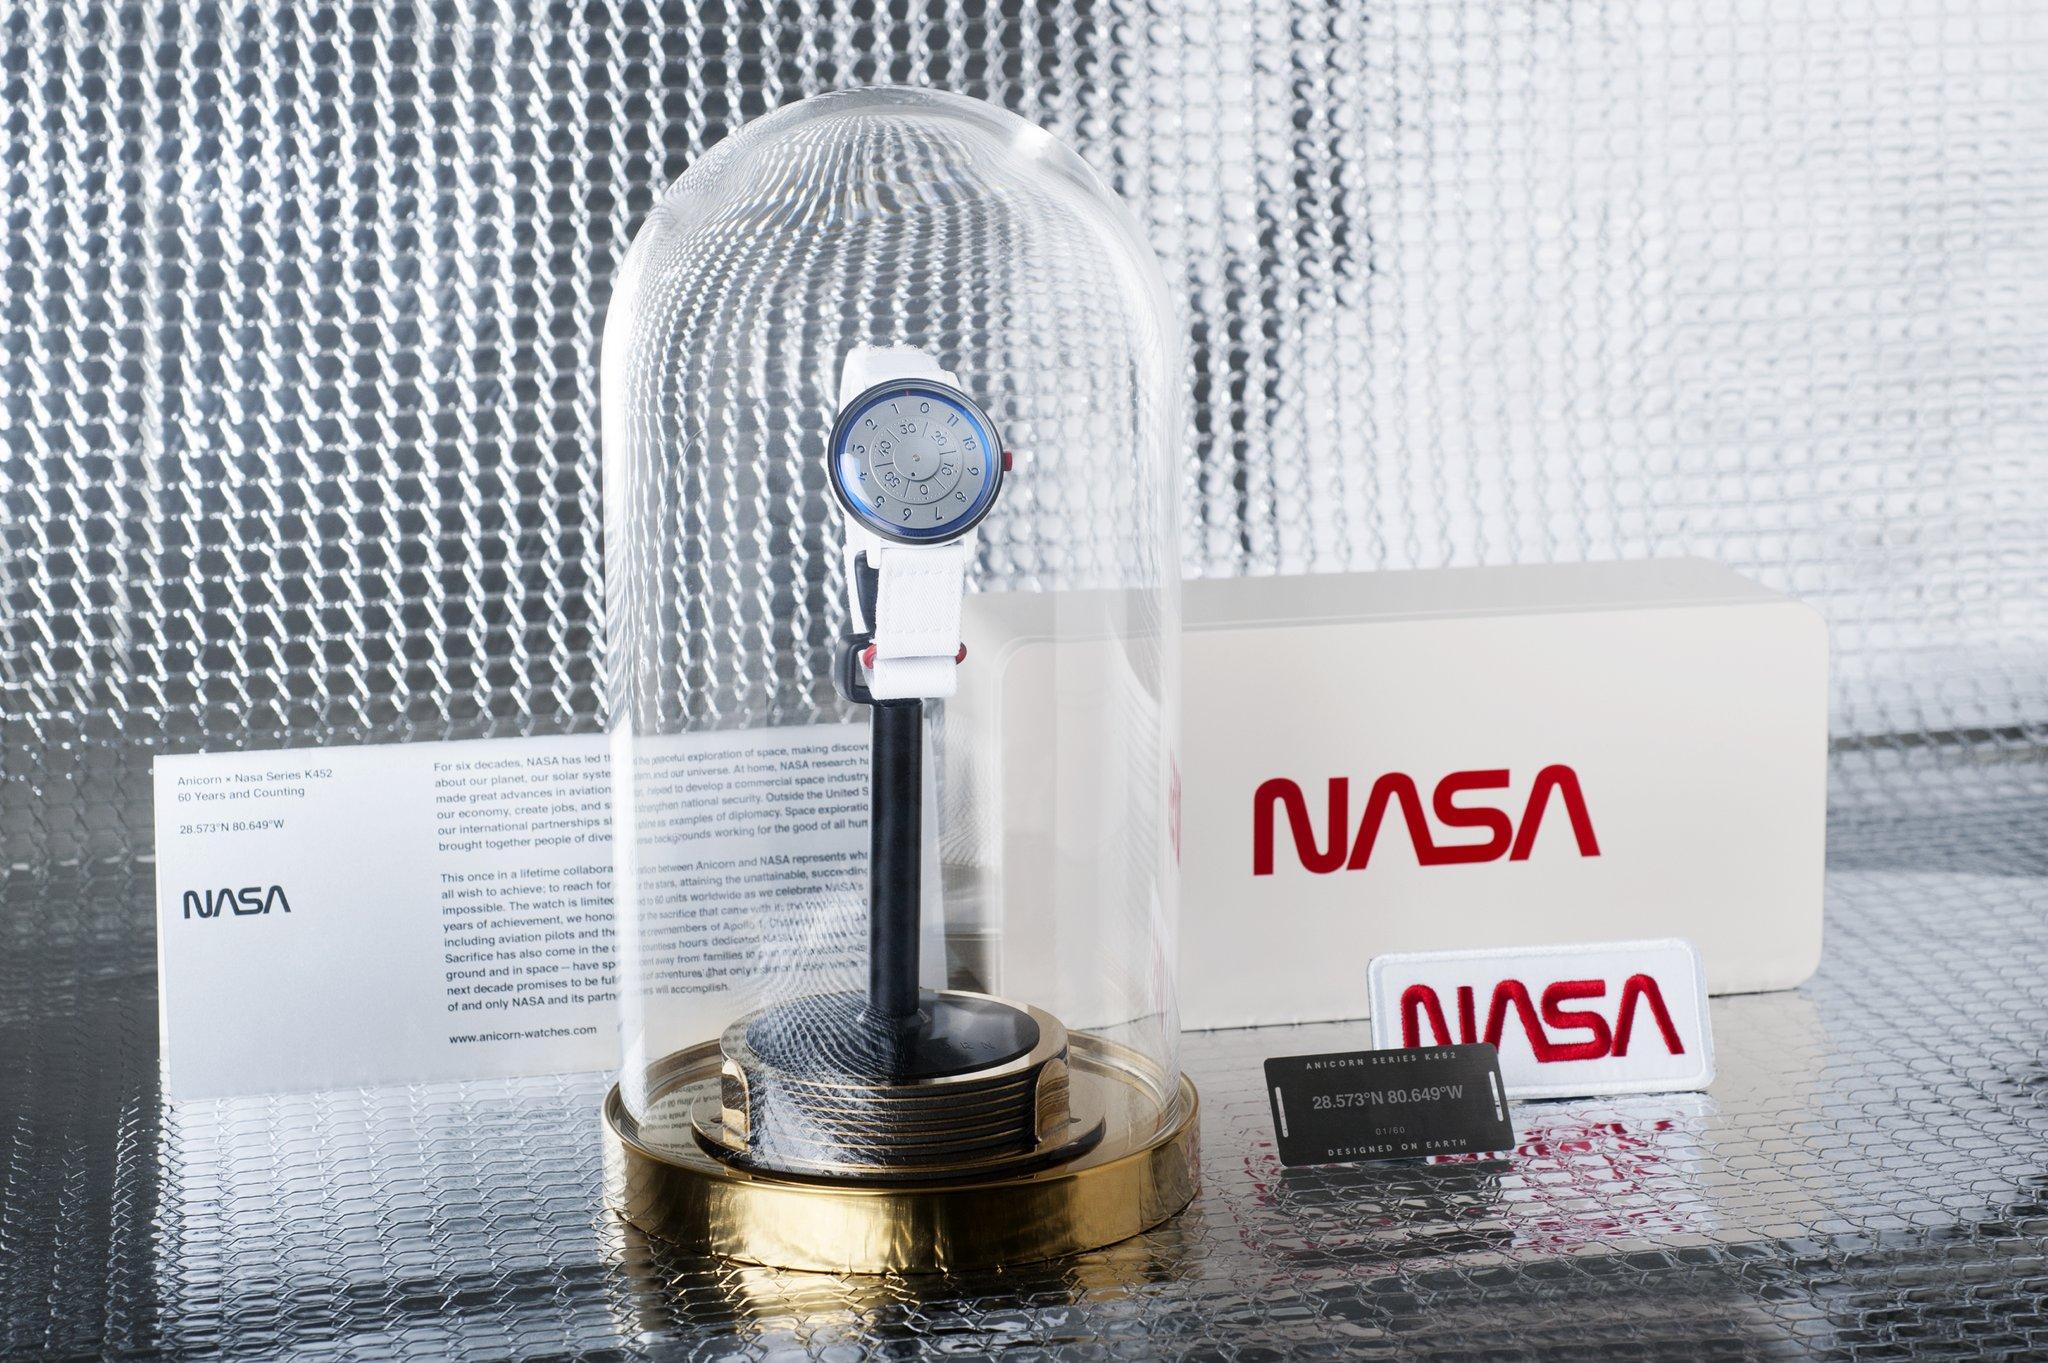 Anicorn x NASA limited edition watch